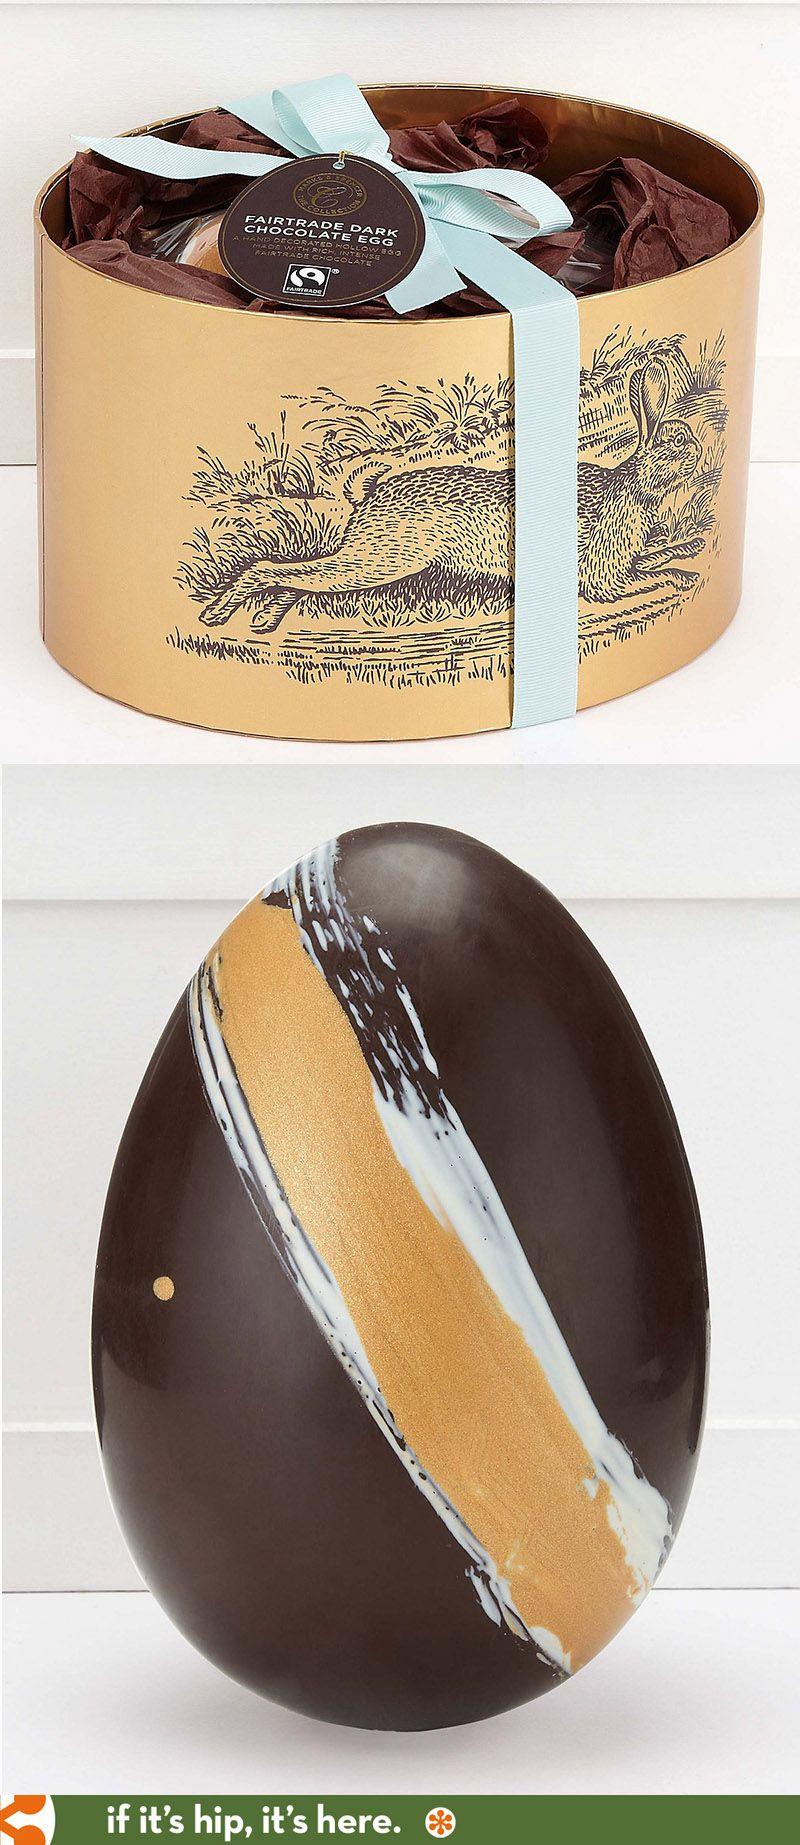 A beautifully packaged fair trade dark chocolate easter egg from a beautifully packaged fair trade dark chocolate easter egg from marks and spencer negle Choice Image